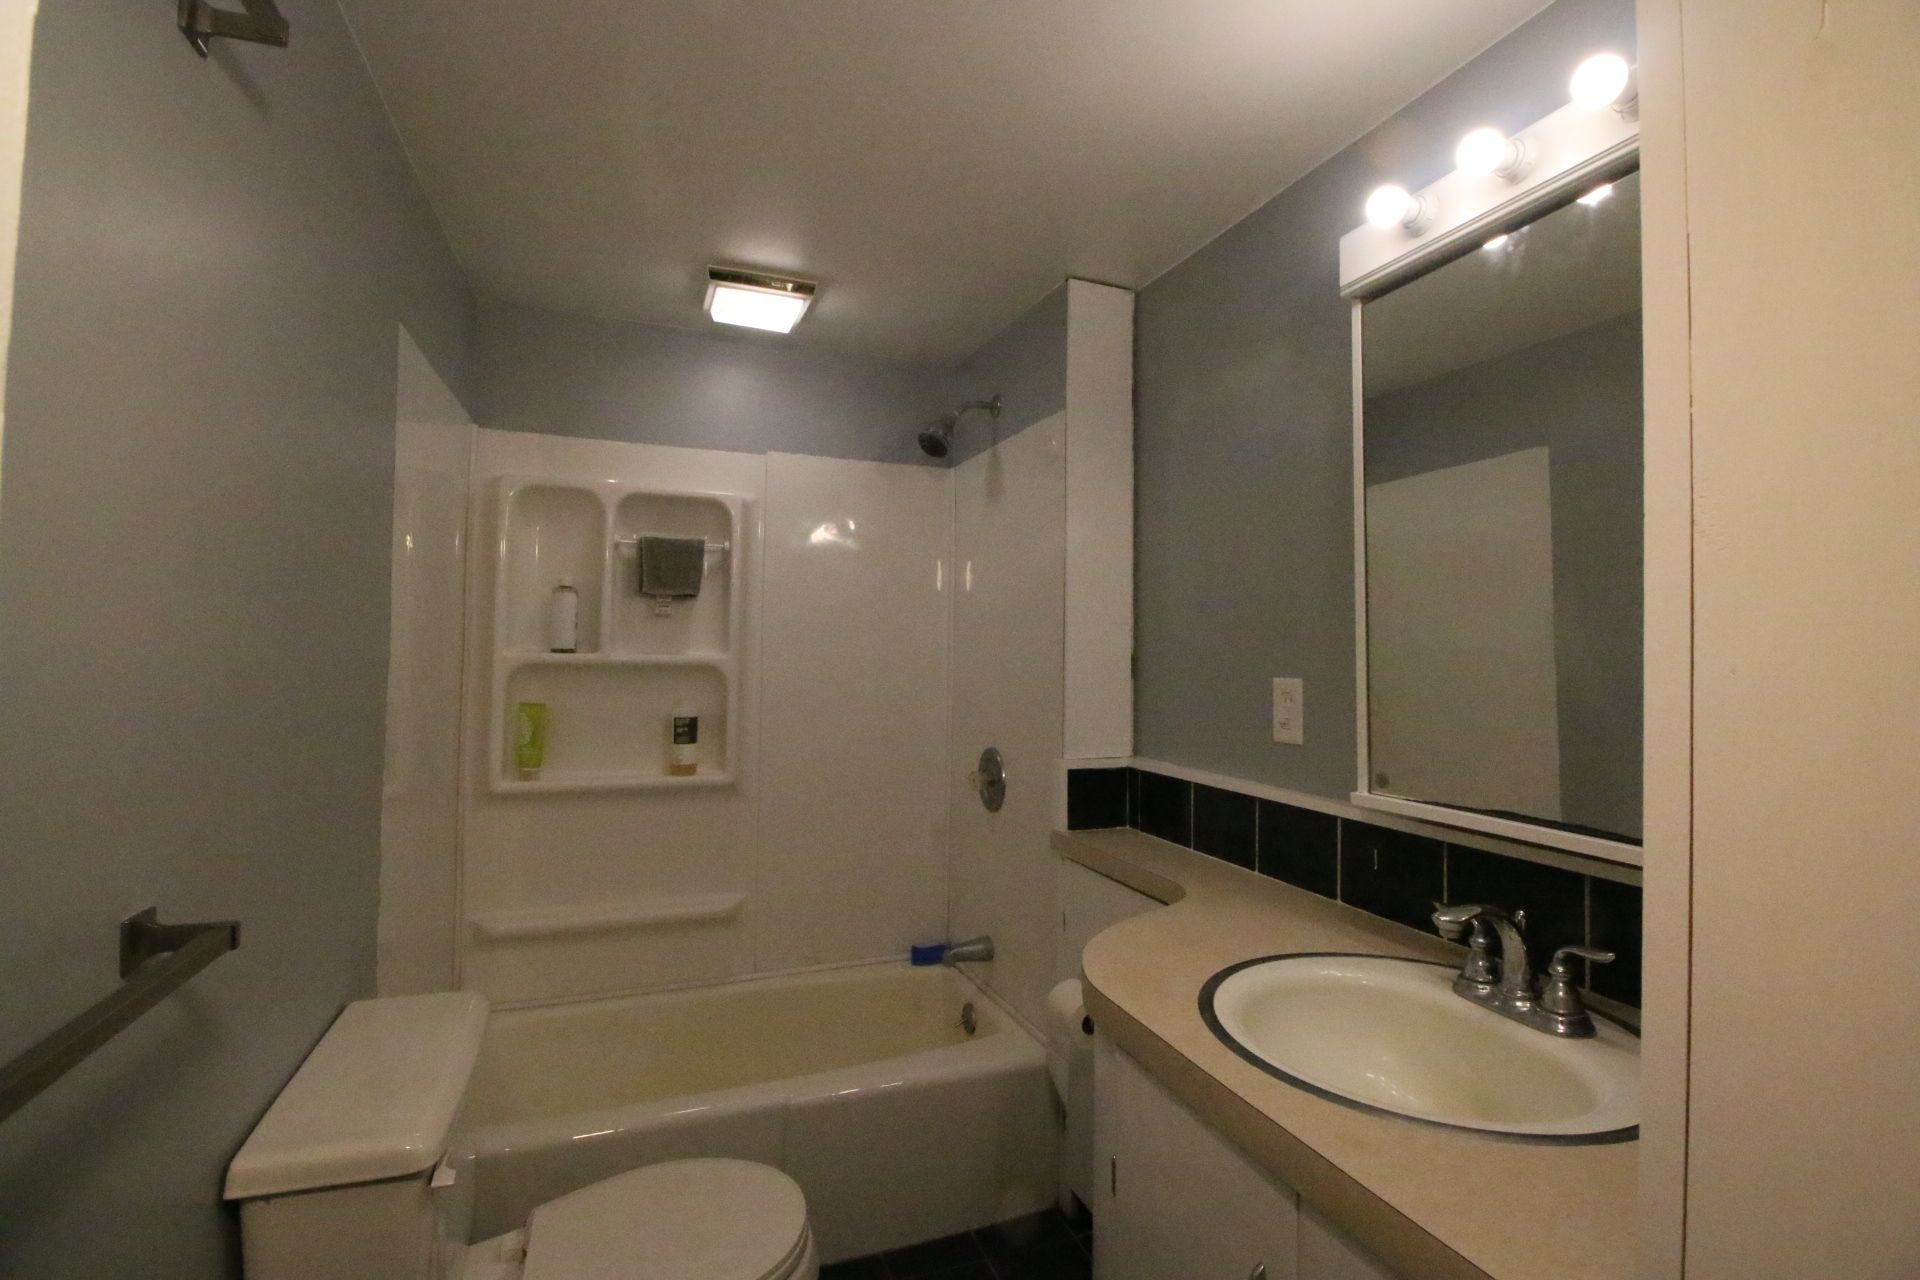 Bathroom after painting | Bathroom mirror, Home remodeling ...